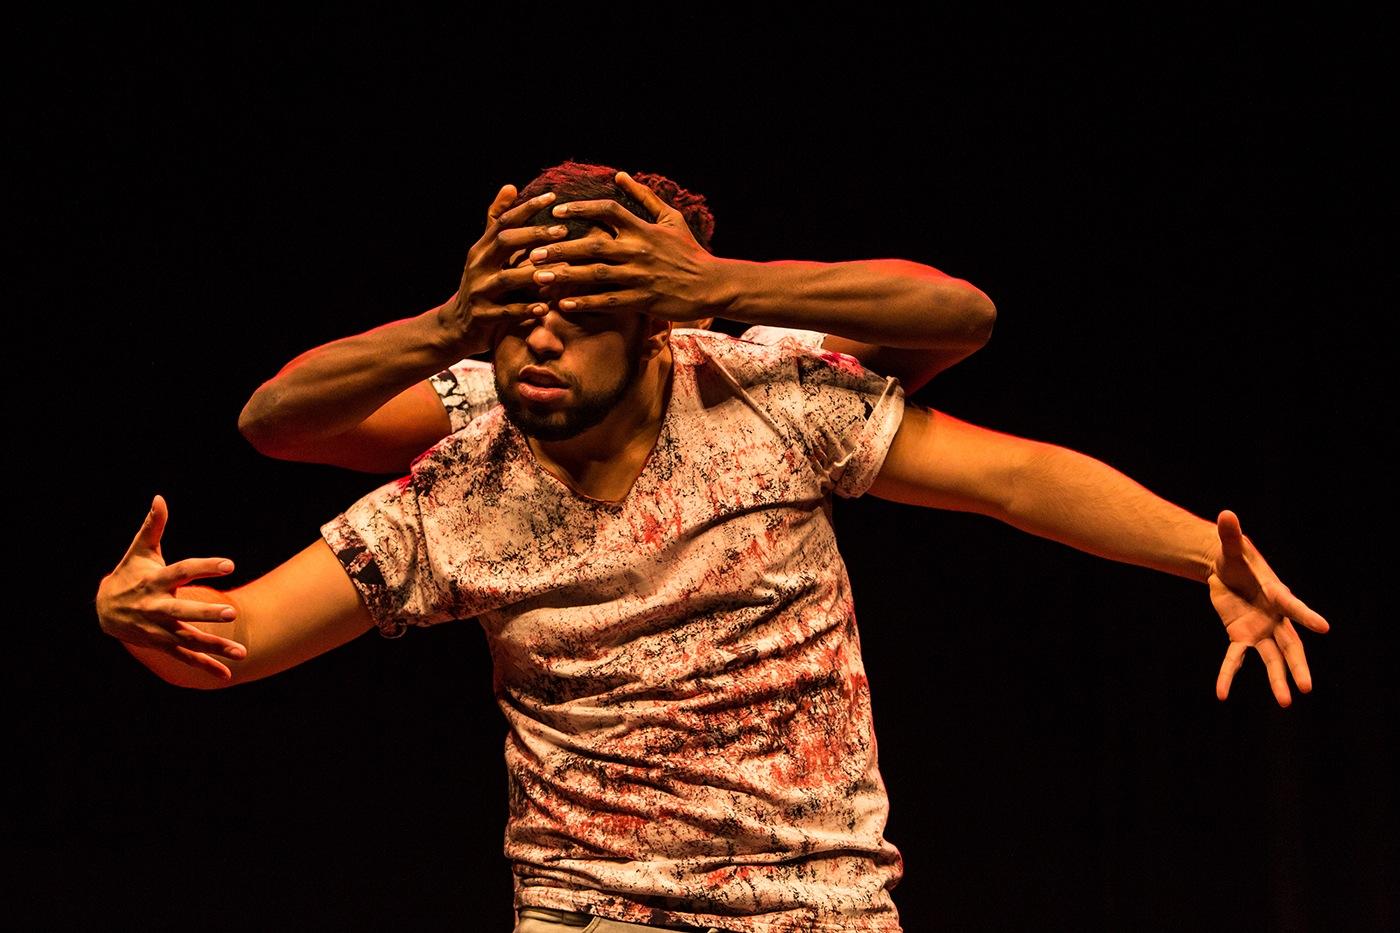 photographe-reportage-danse-avec-ton-crous-guillaume-heraud-037-small